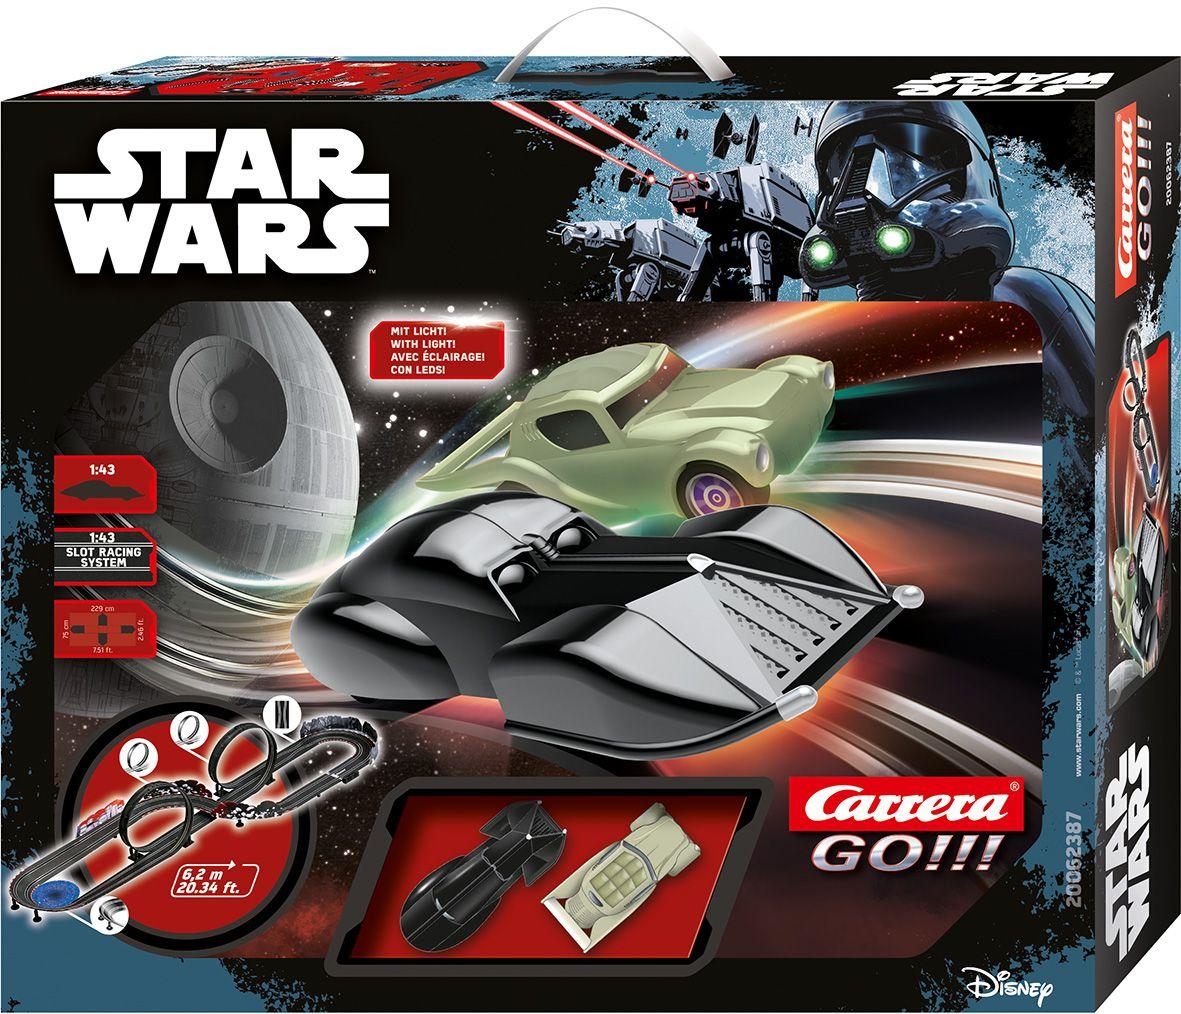 CARRERA Carrera Autorennbahn, »Carrera® GO!!! Disney Star Wars«